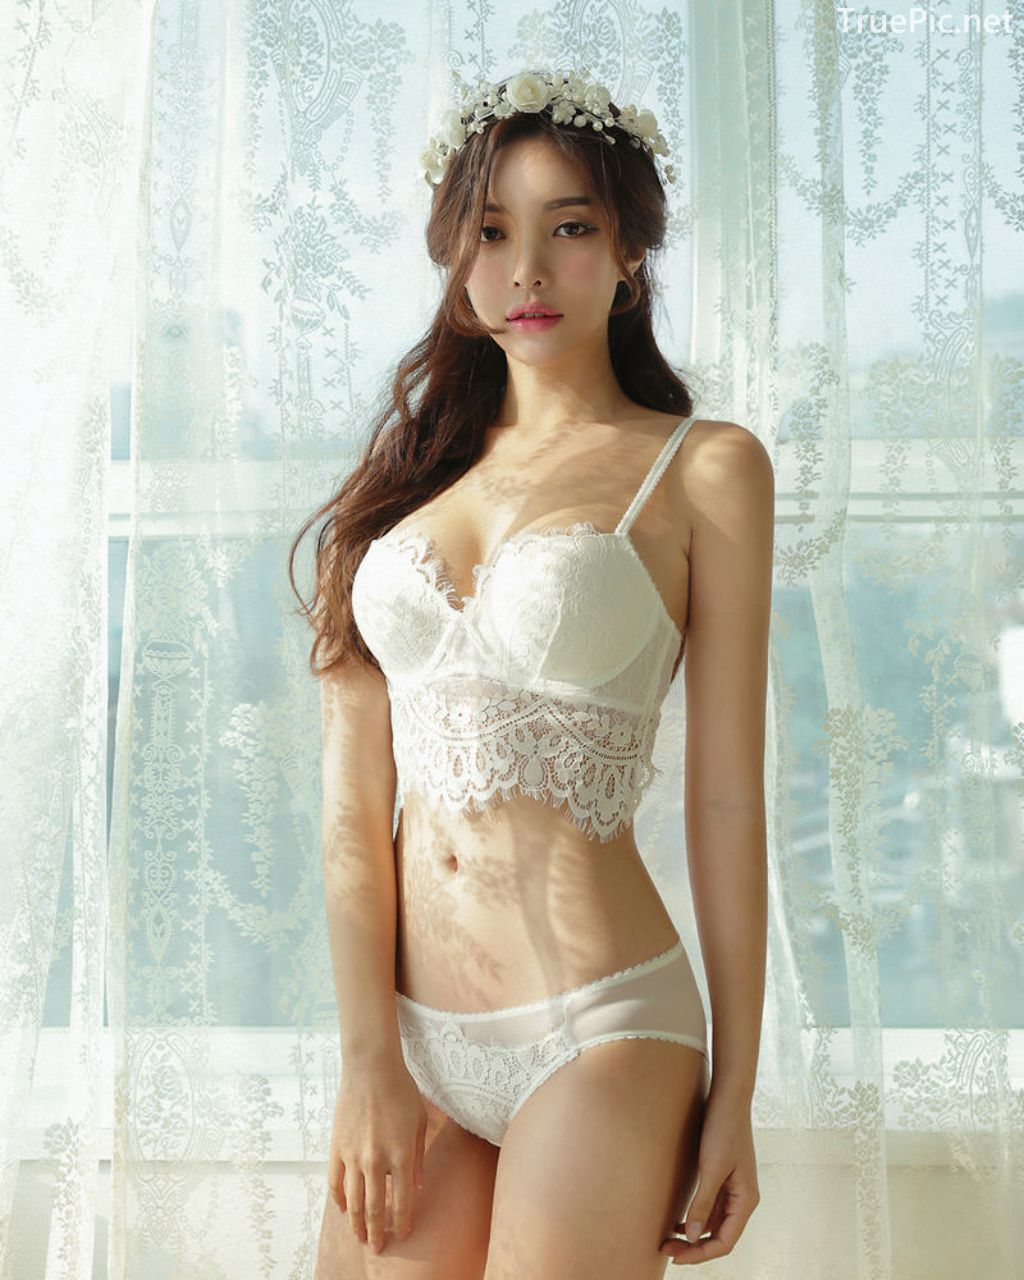 Korean Fashion Model - Jin Hee - Lovely Soft Lace Lingerie - TruePic.net - Picture 9